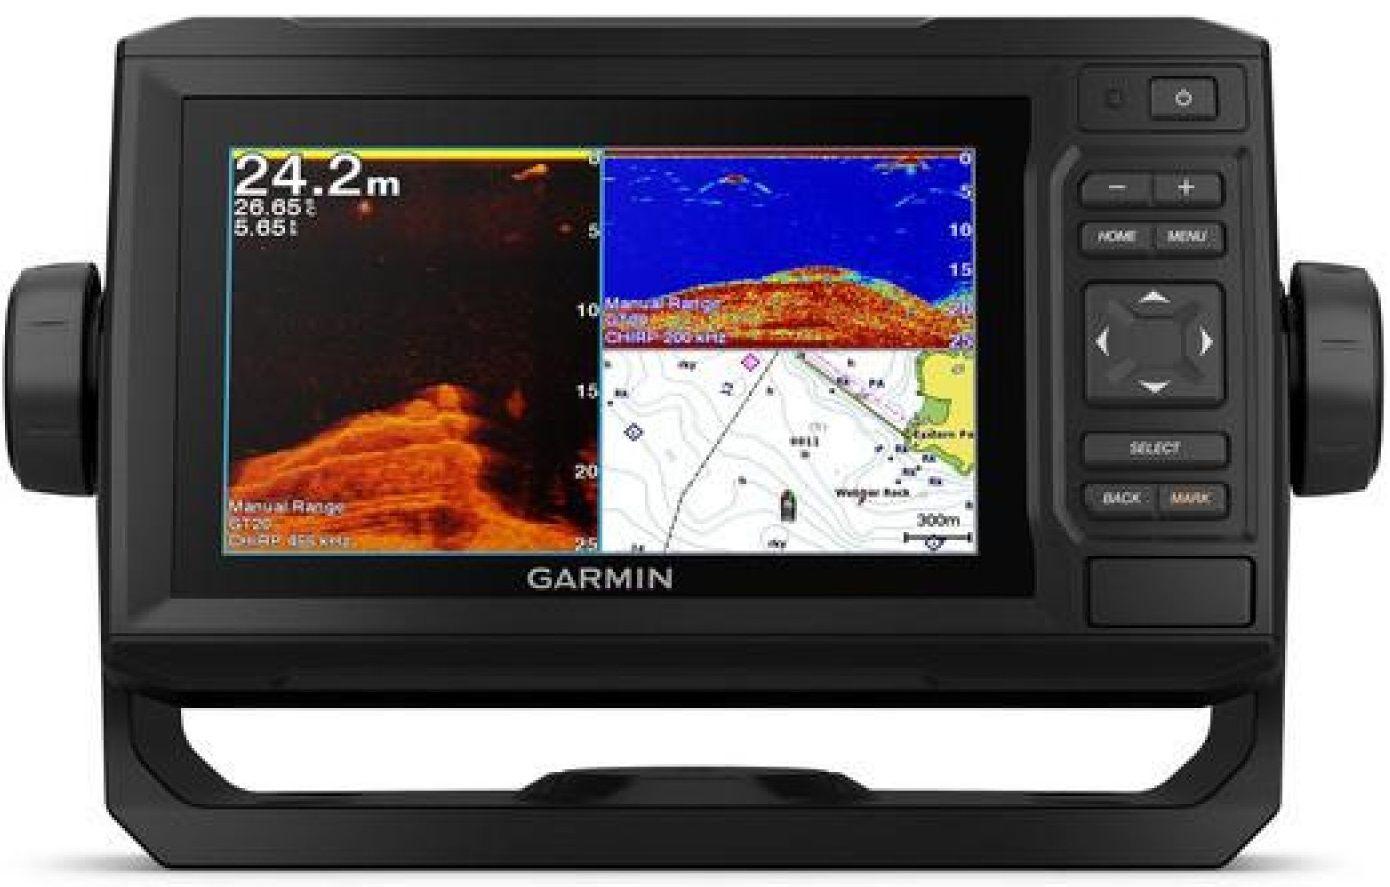 Gps Sonar Garmin Echomap 62CV Plus Sem Transdutor 010-01888-00